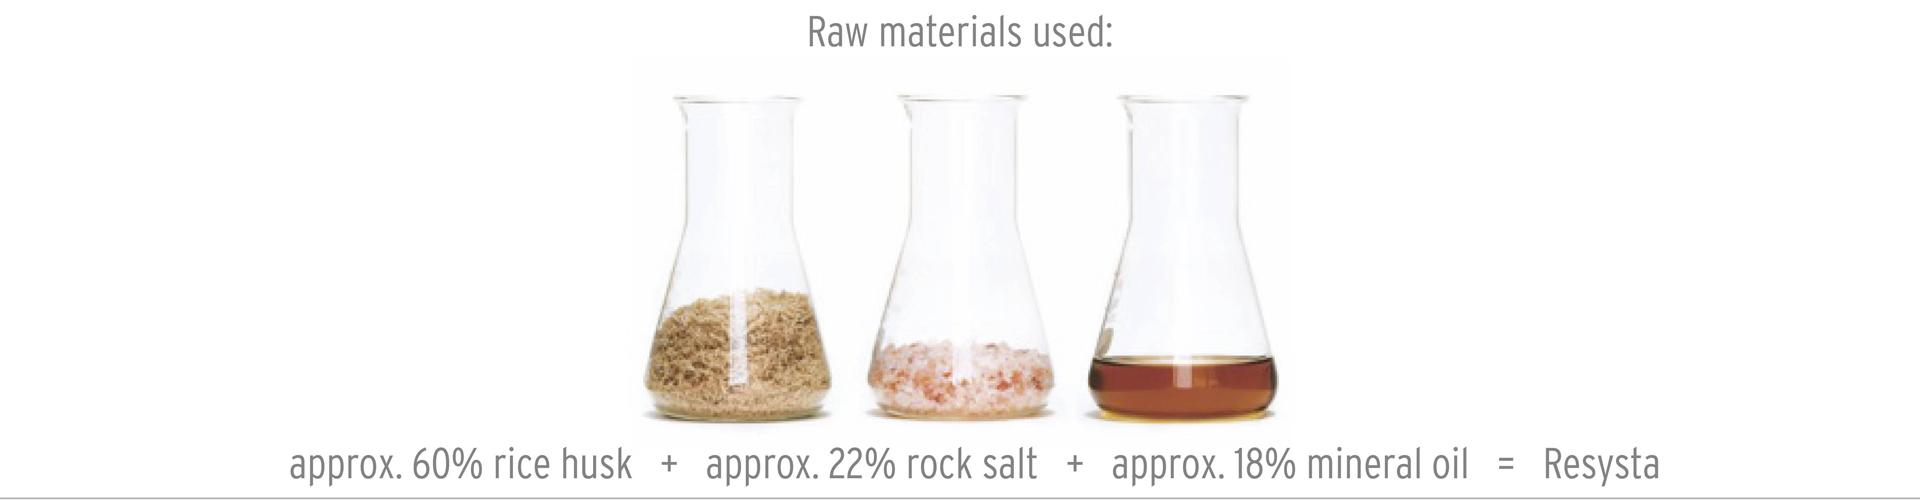 Resysta Ingredients